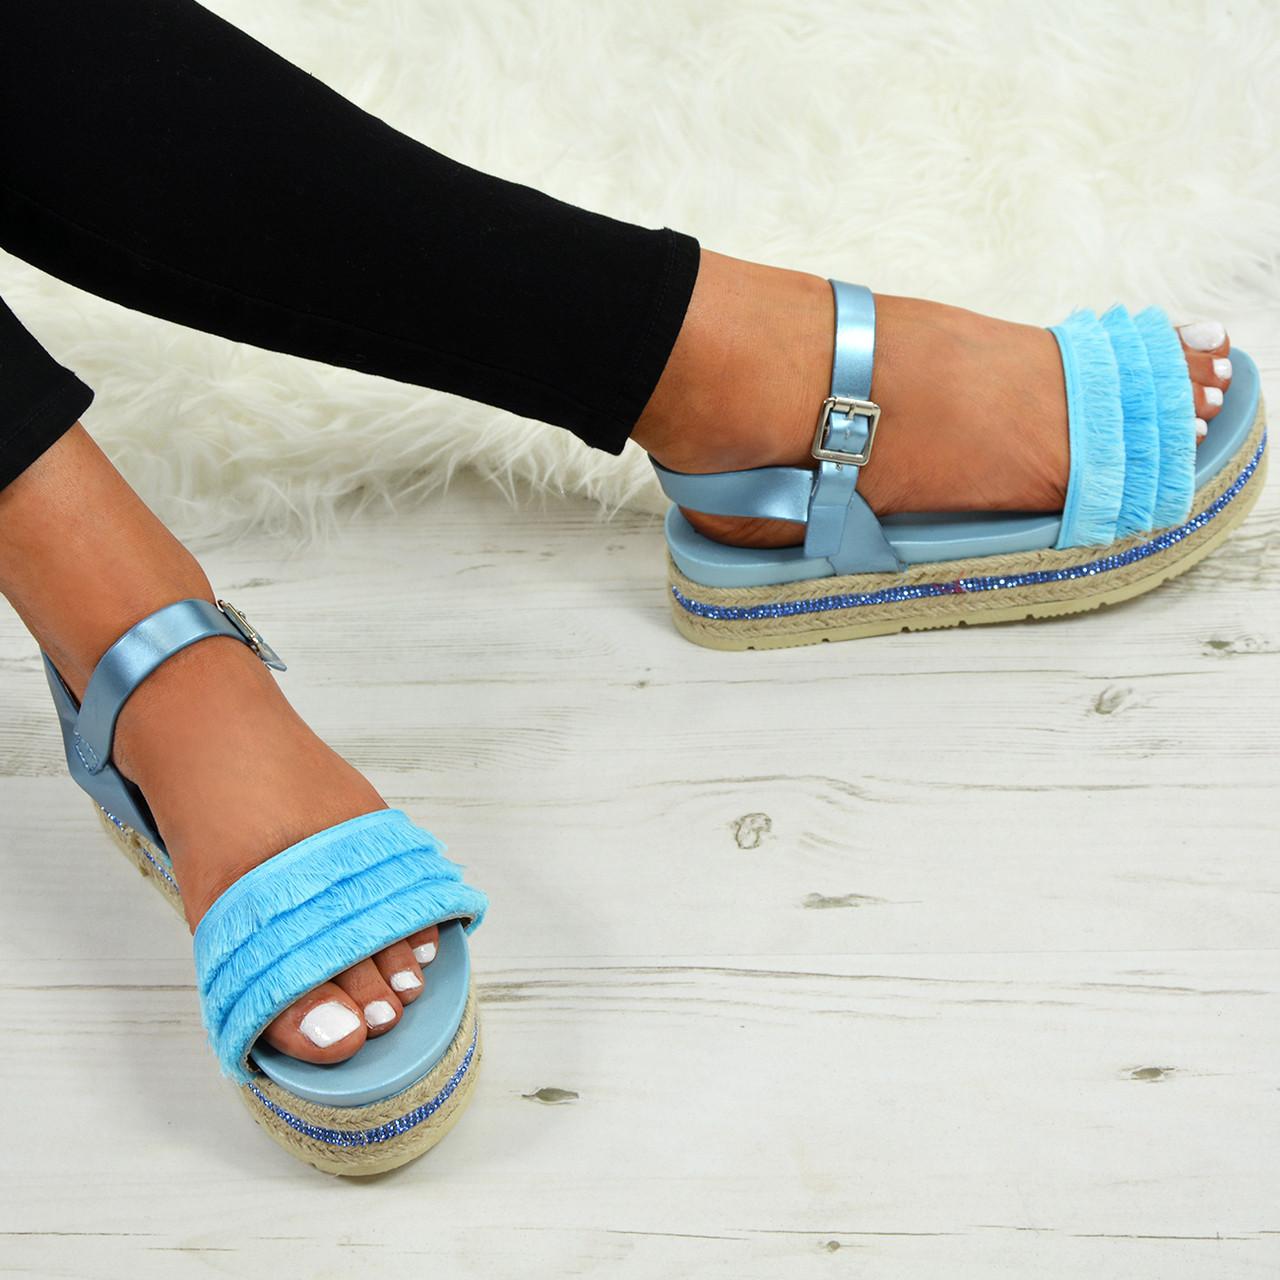 beb3999753f5 Ladies Womens Espadrille Flatforms Summer Sandals Platform Wedge Shoes Sizes